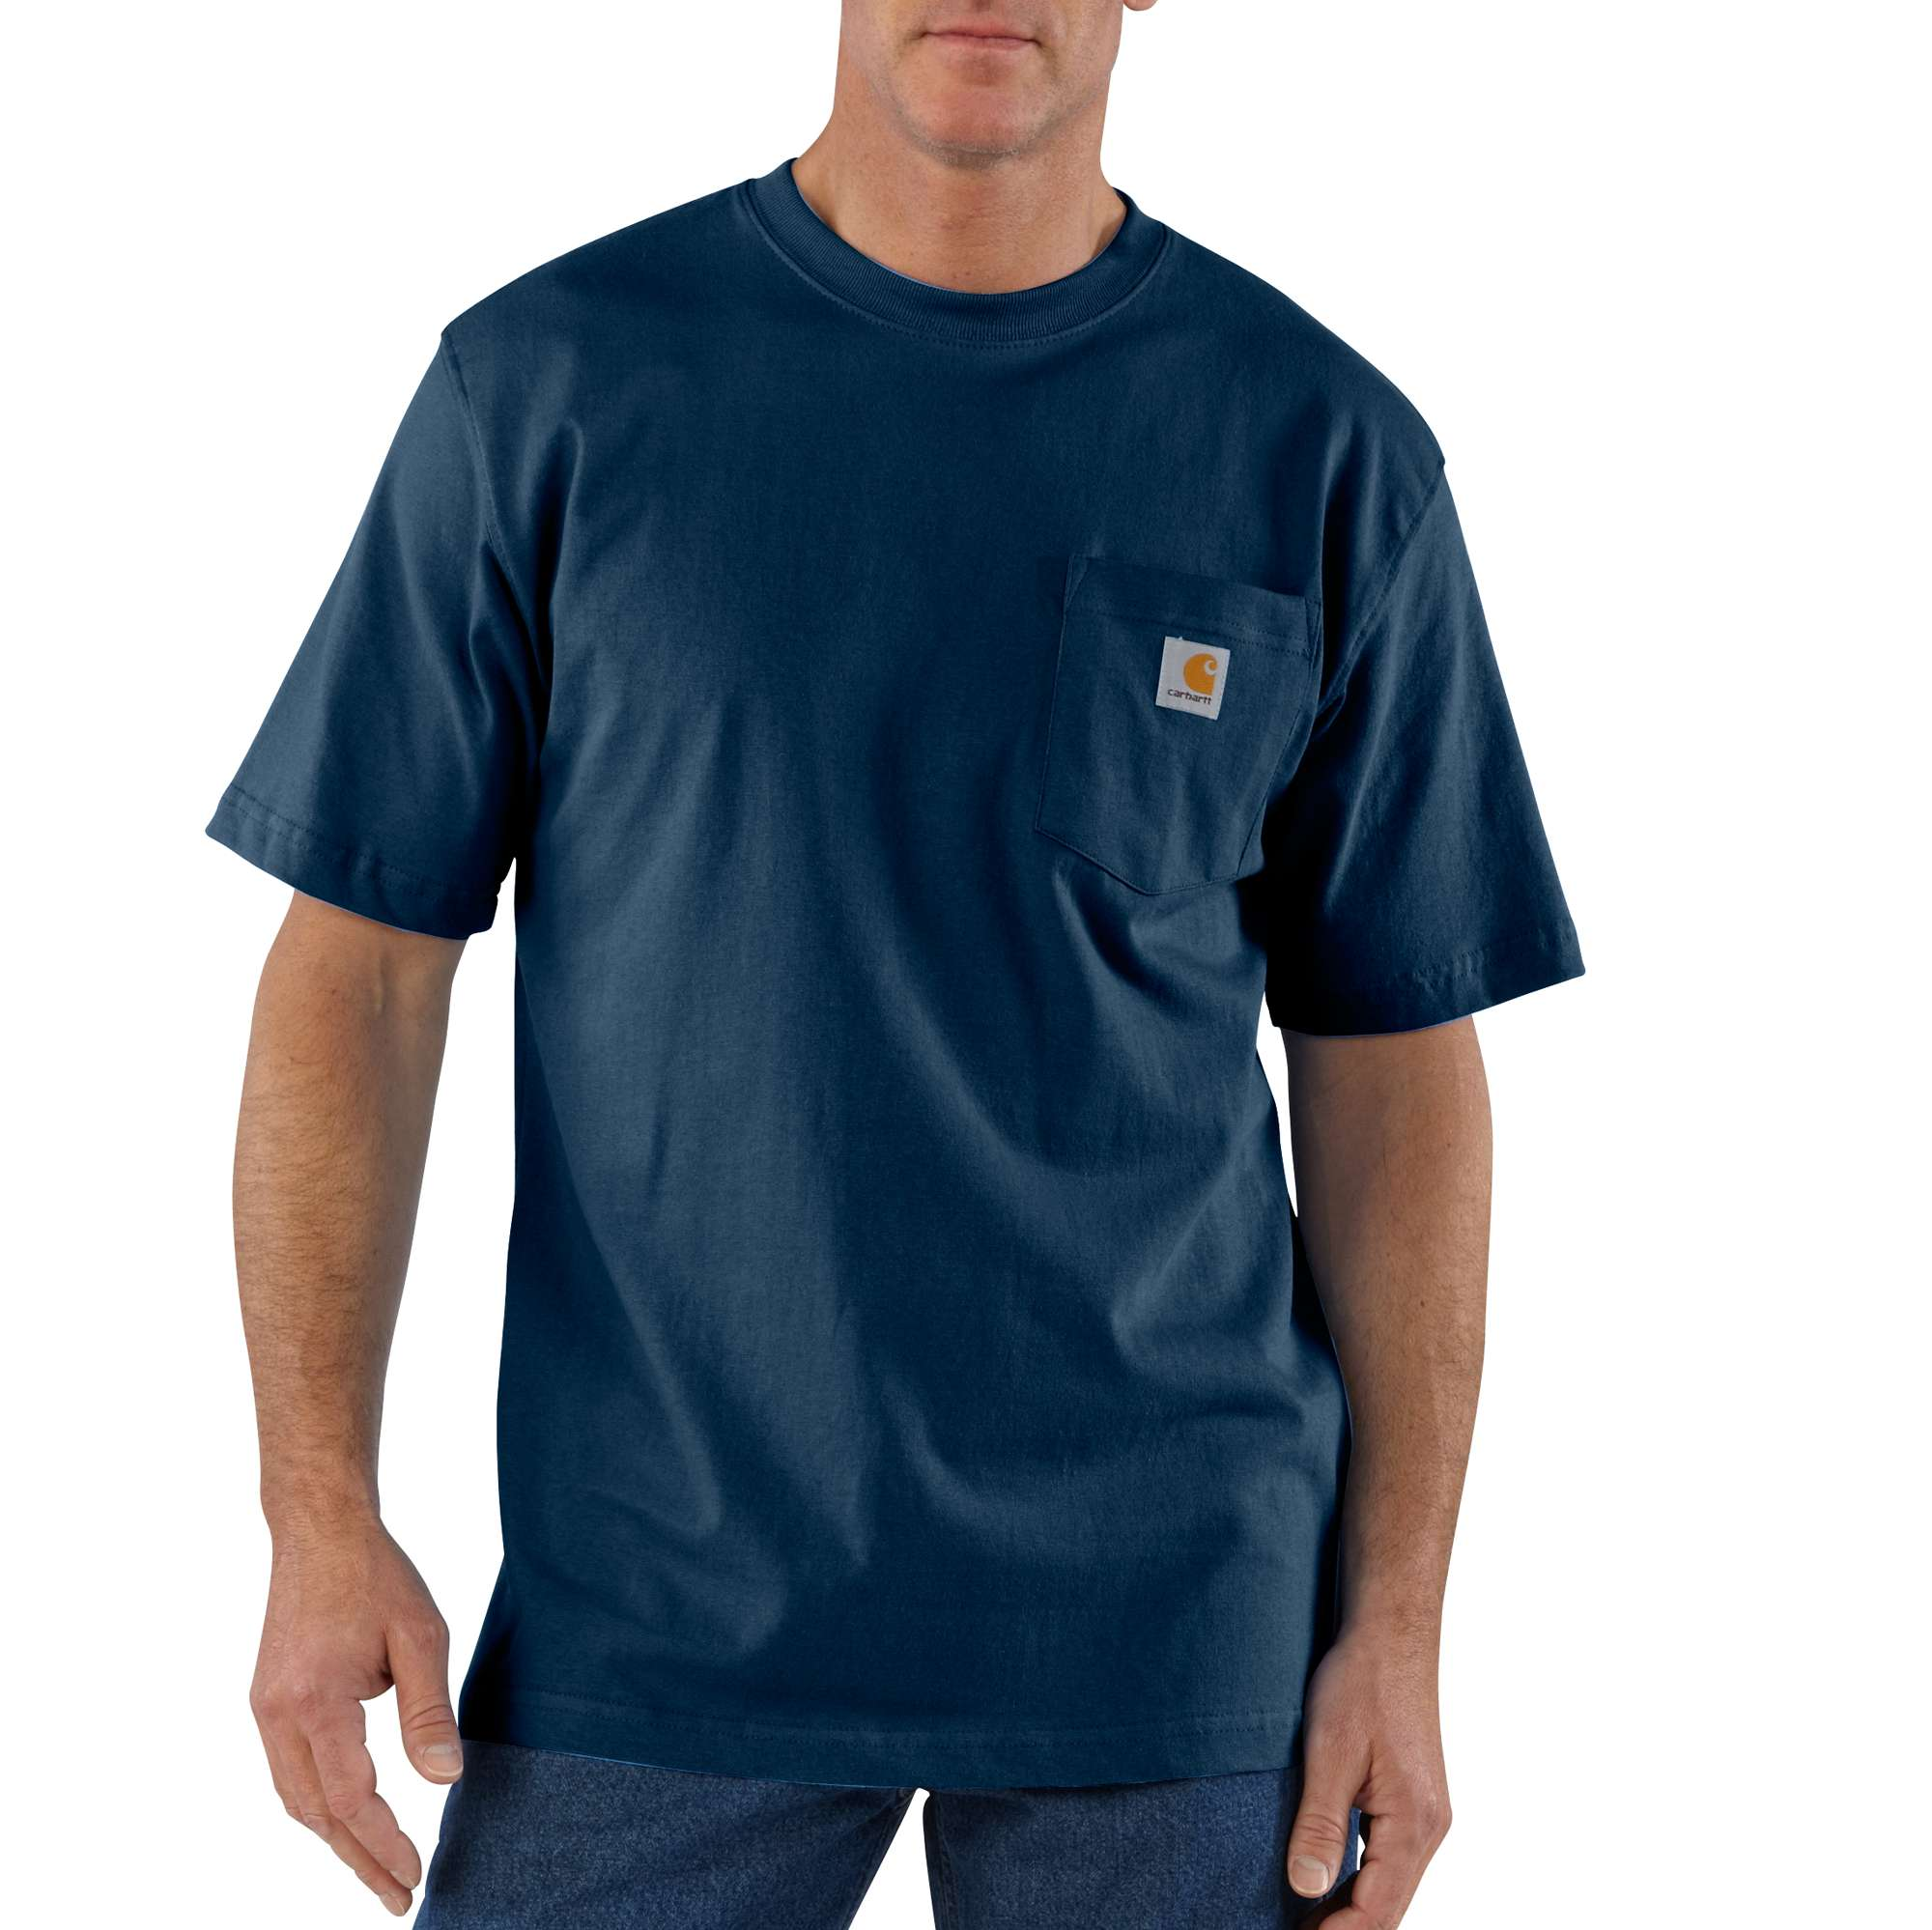 Men's Big & Tall Workwear Pocket T-shirt, Navy, swatch